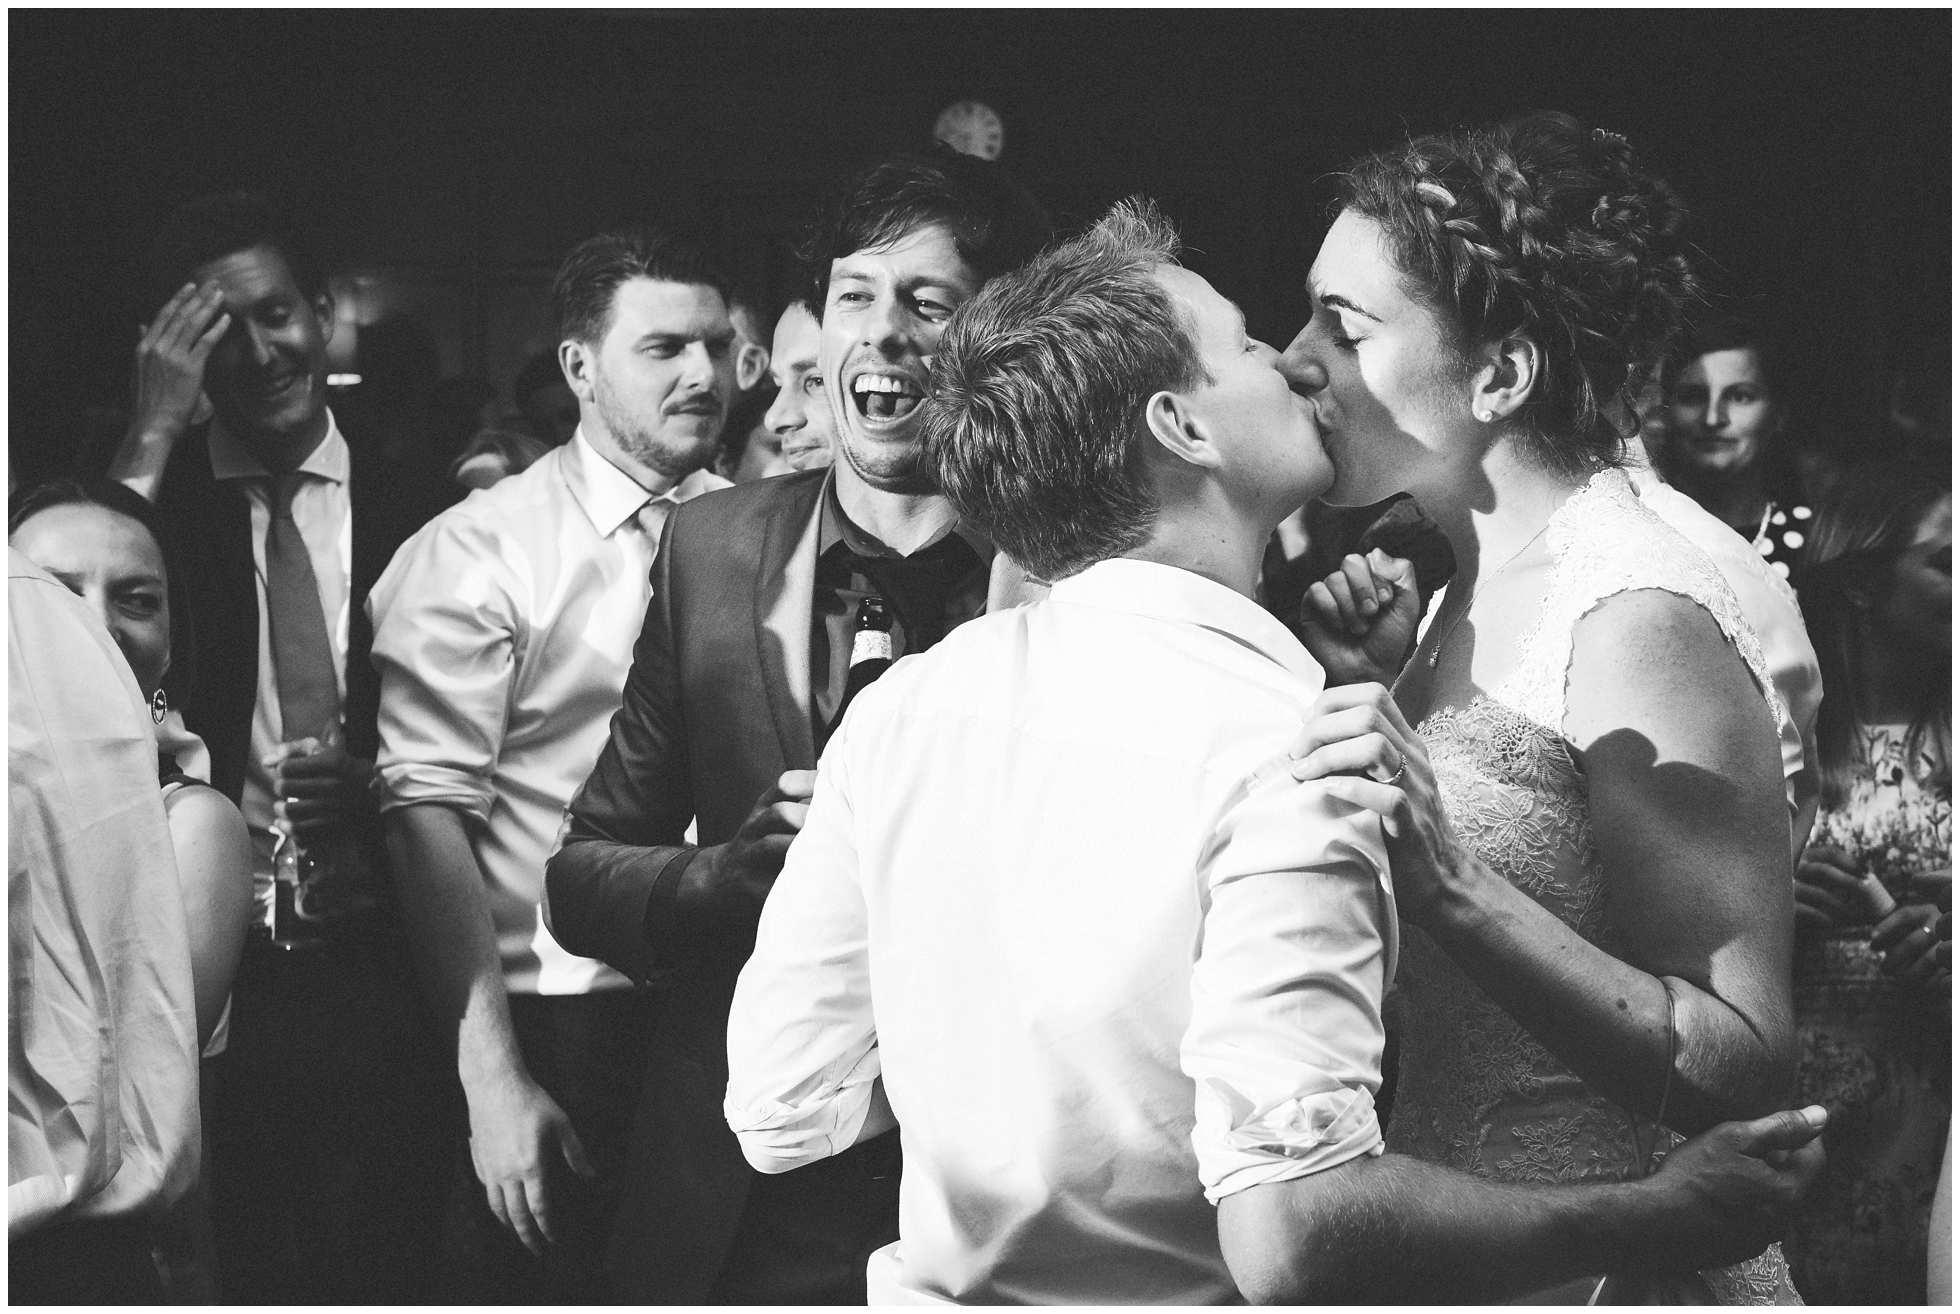 The final wedding kiss